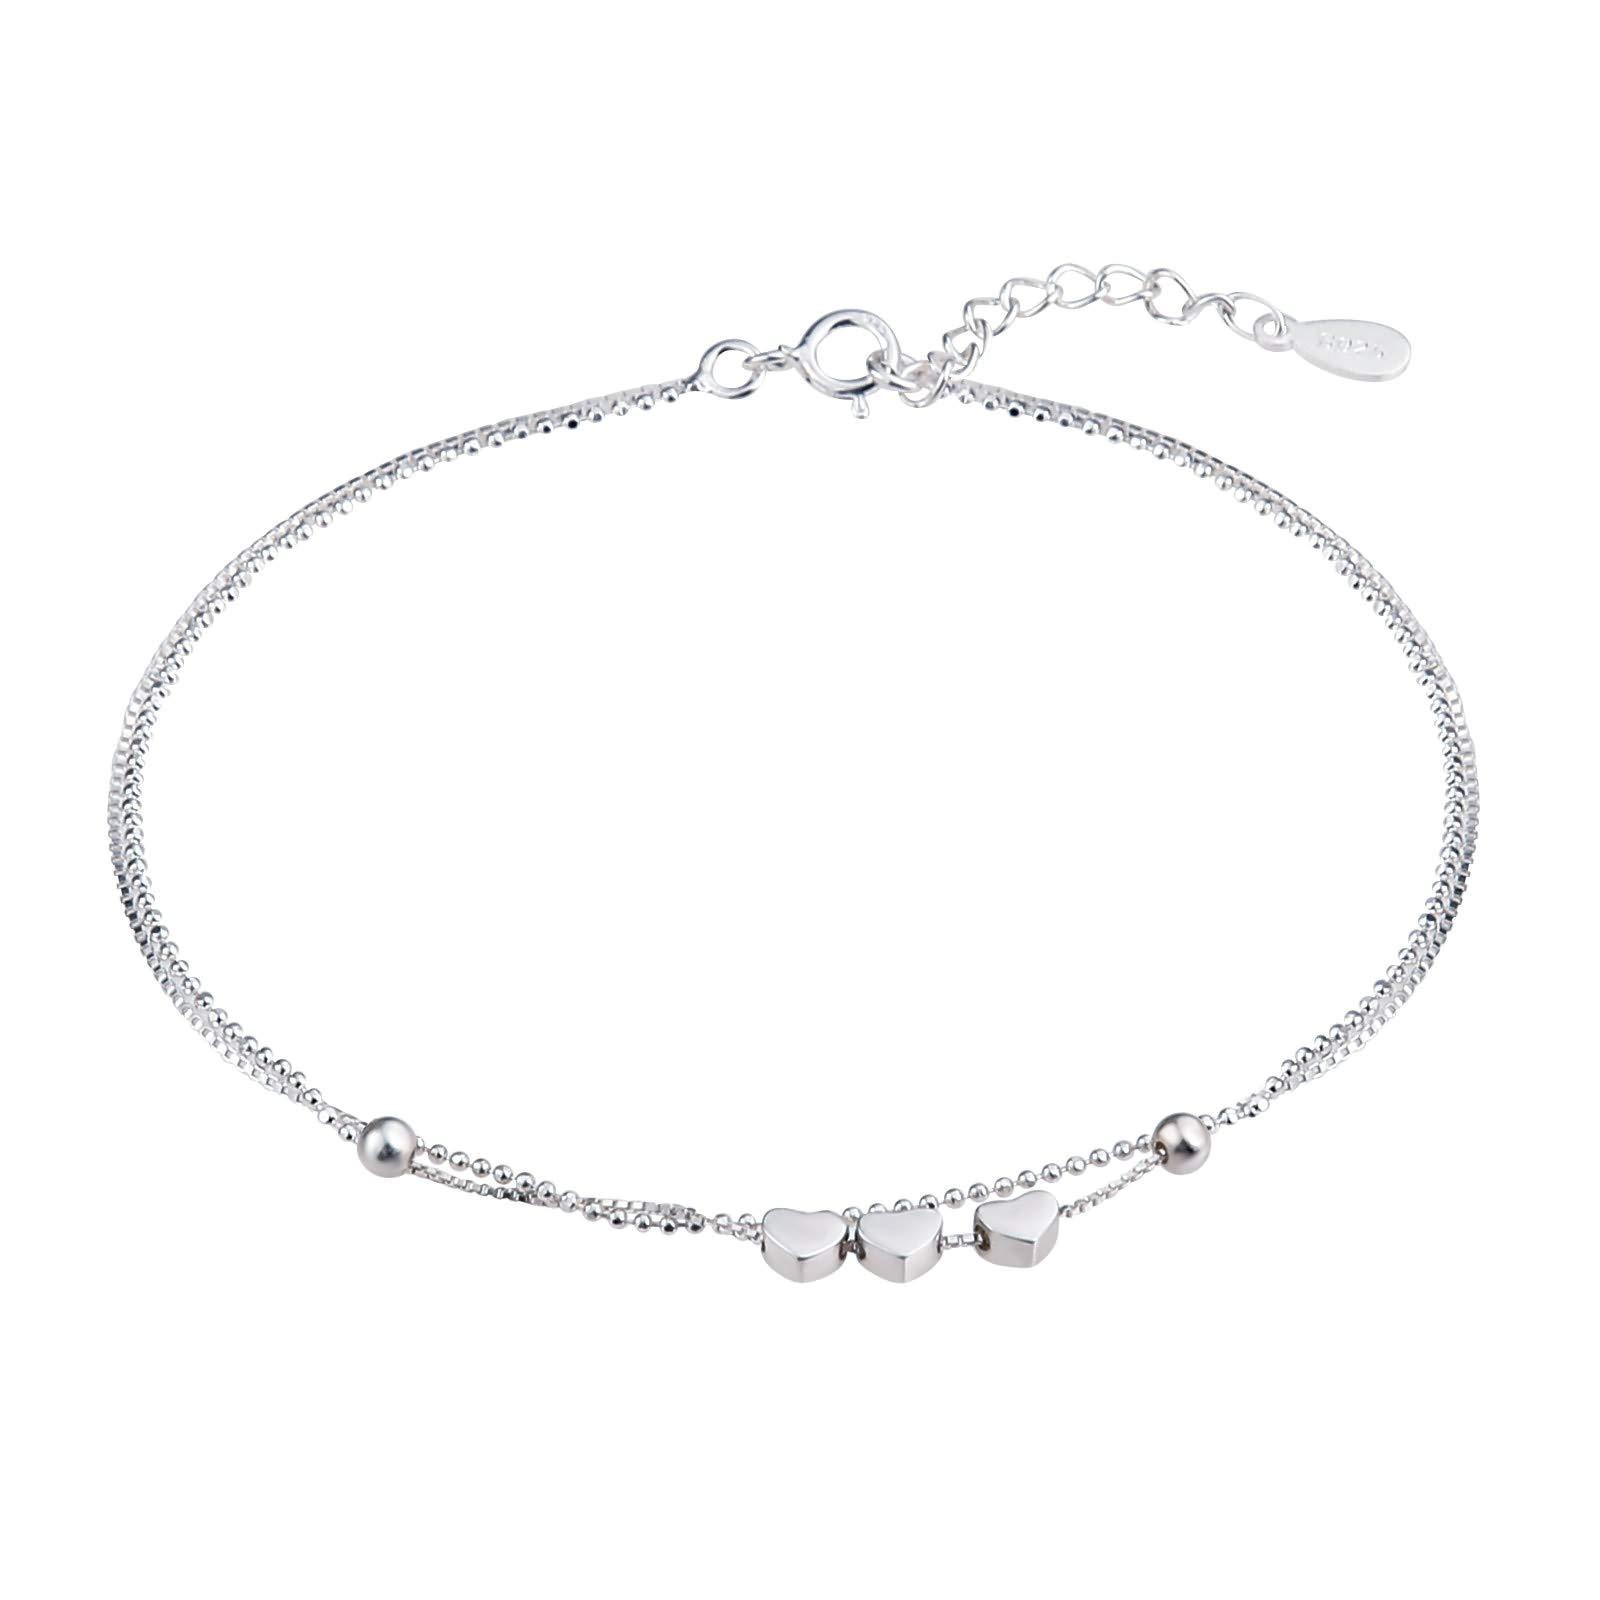 Beydodo Ankle Bracelet Sterling Silver Heart Anklet Chain Barefoot Double Chain Heart